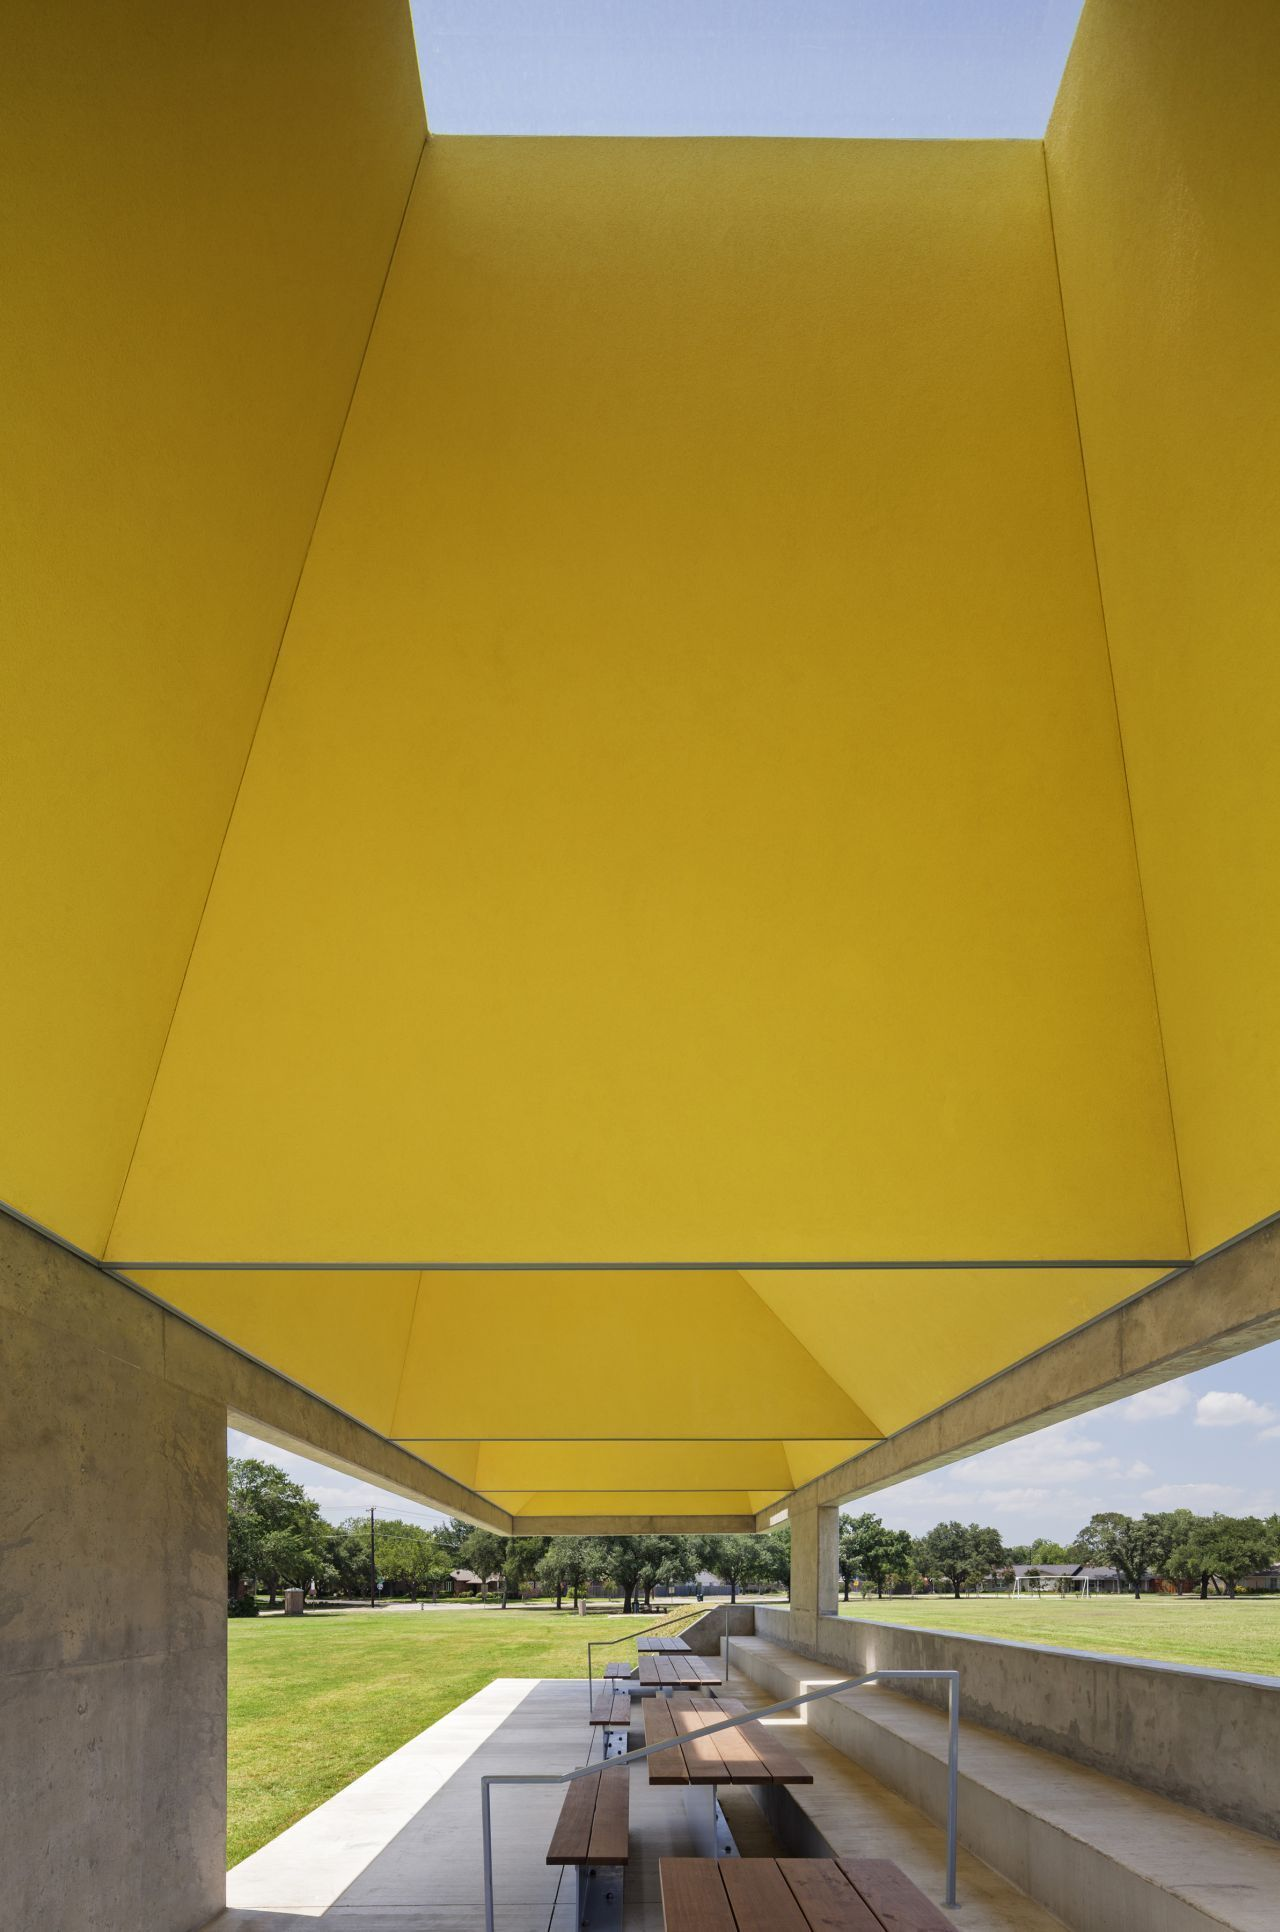 Webb Chapel Park Pavilion in Dallas by Cooper Joseph Studio